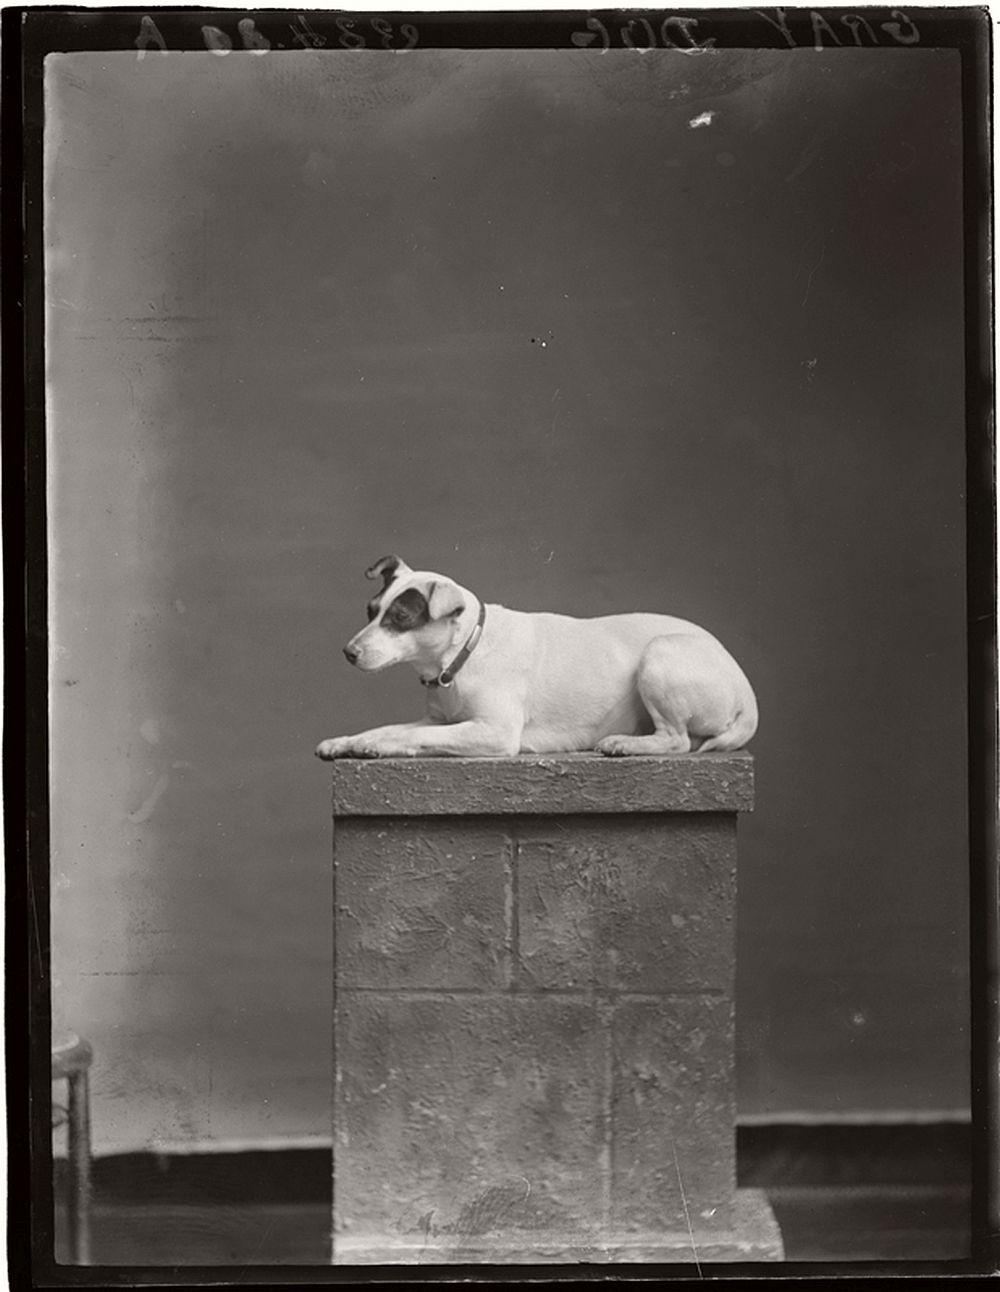 vintage-glass-wet-plate-collodion-portraits-of-pets-1910s-12